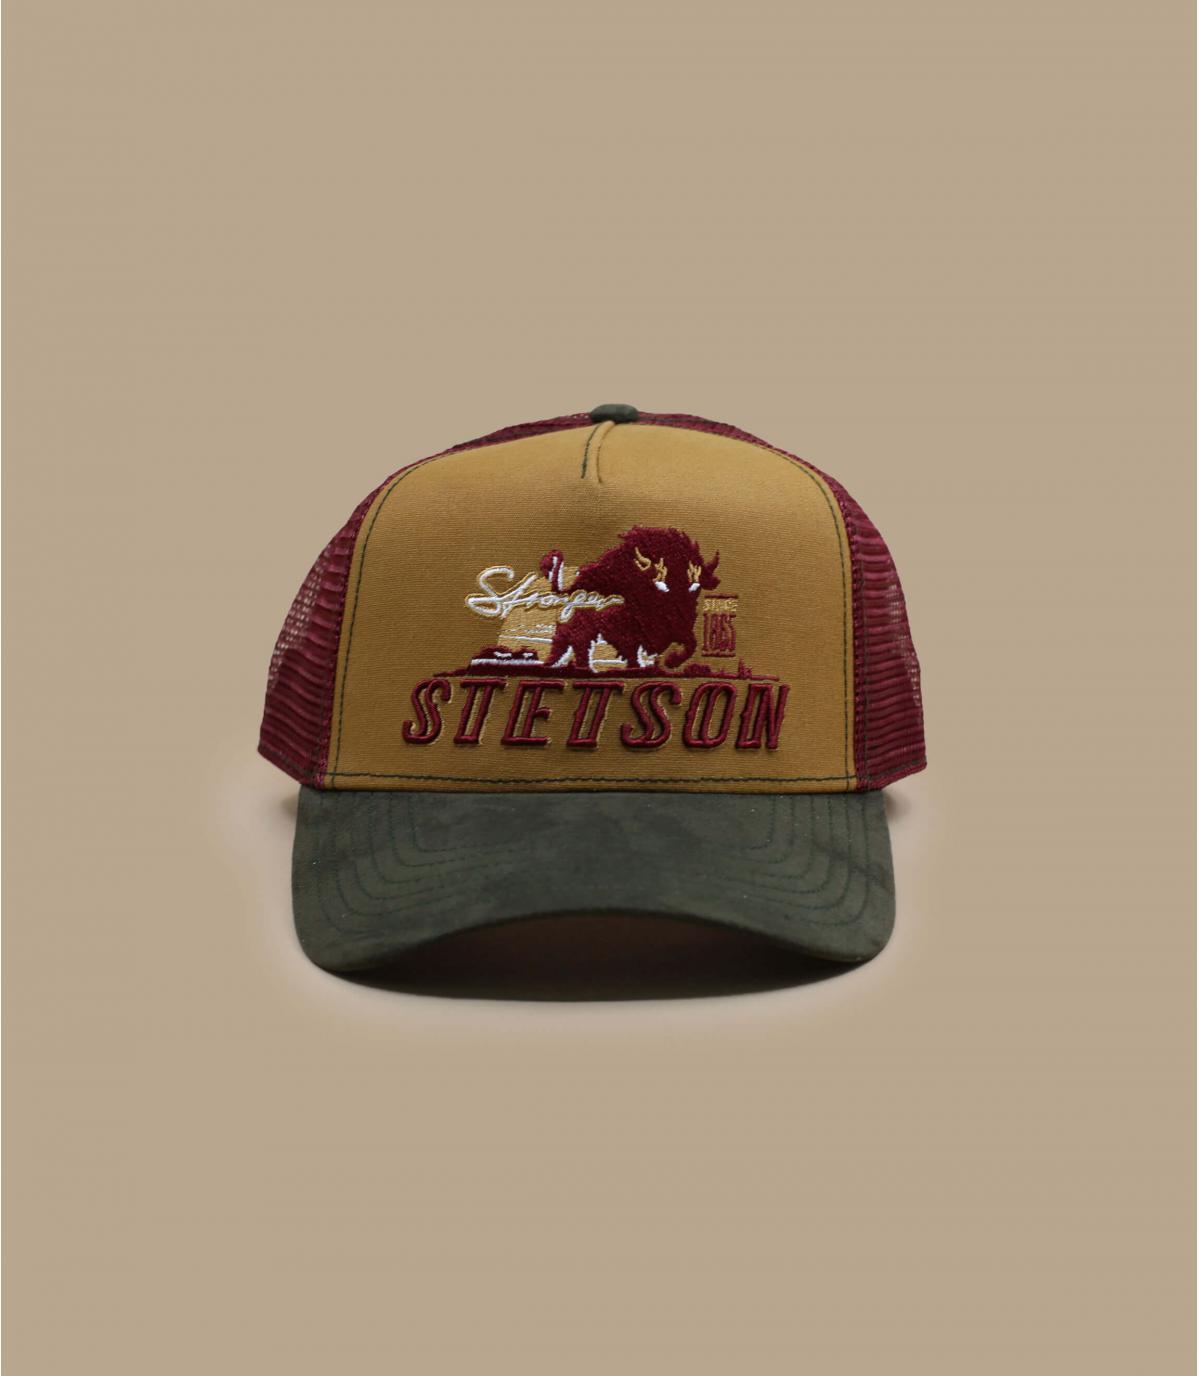 Stetson buffalo trucker cap